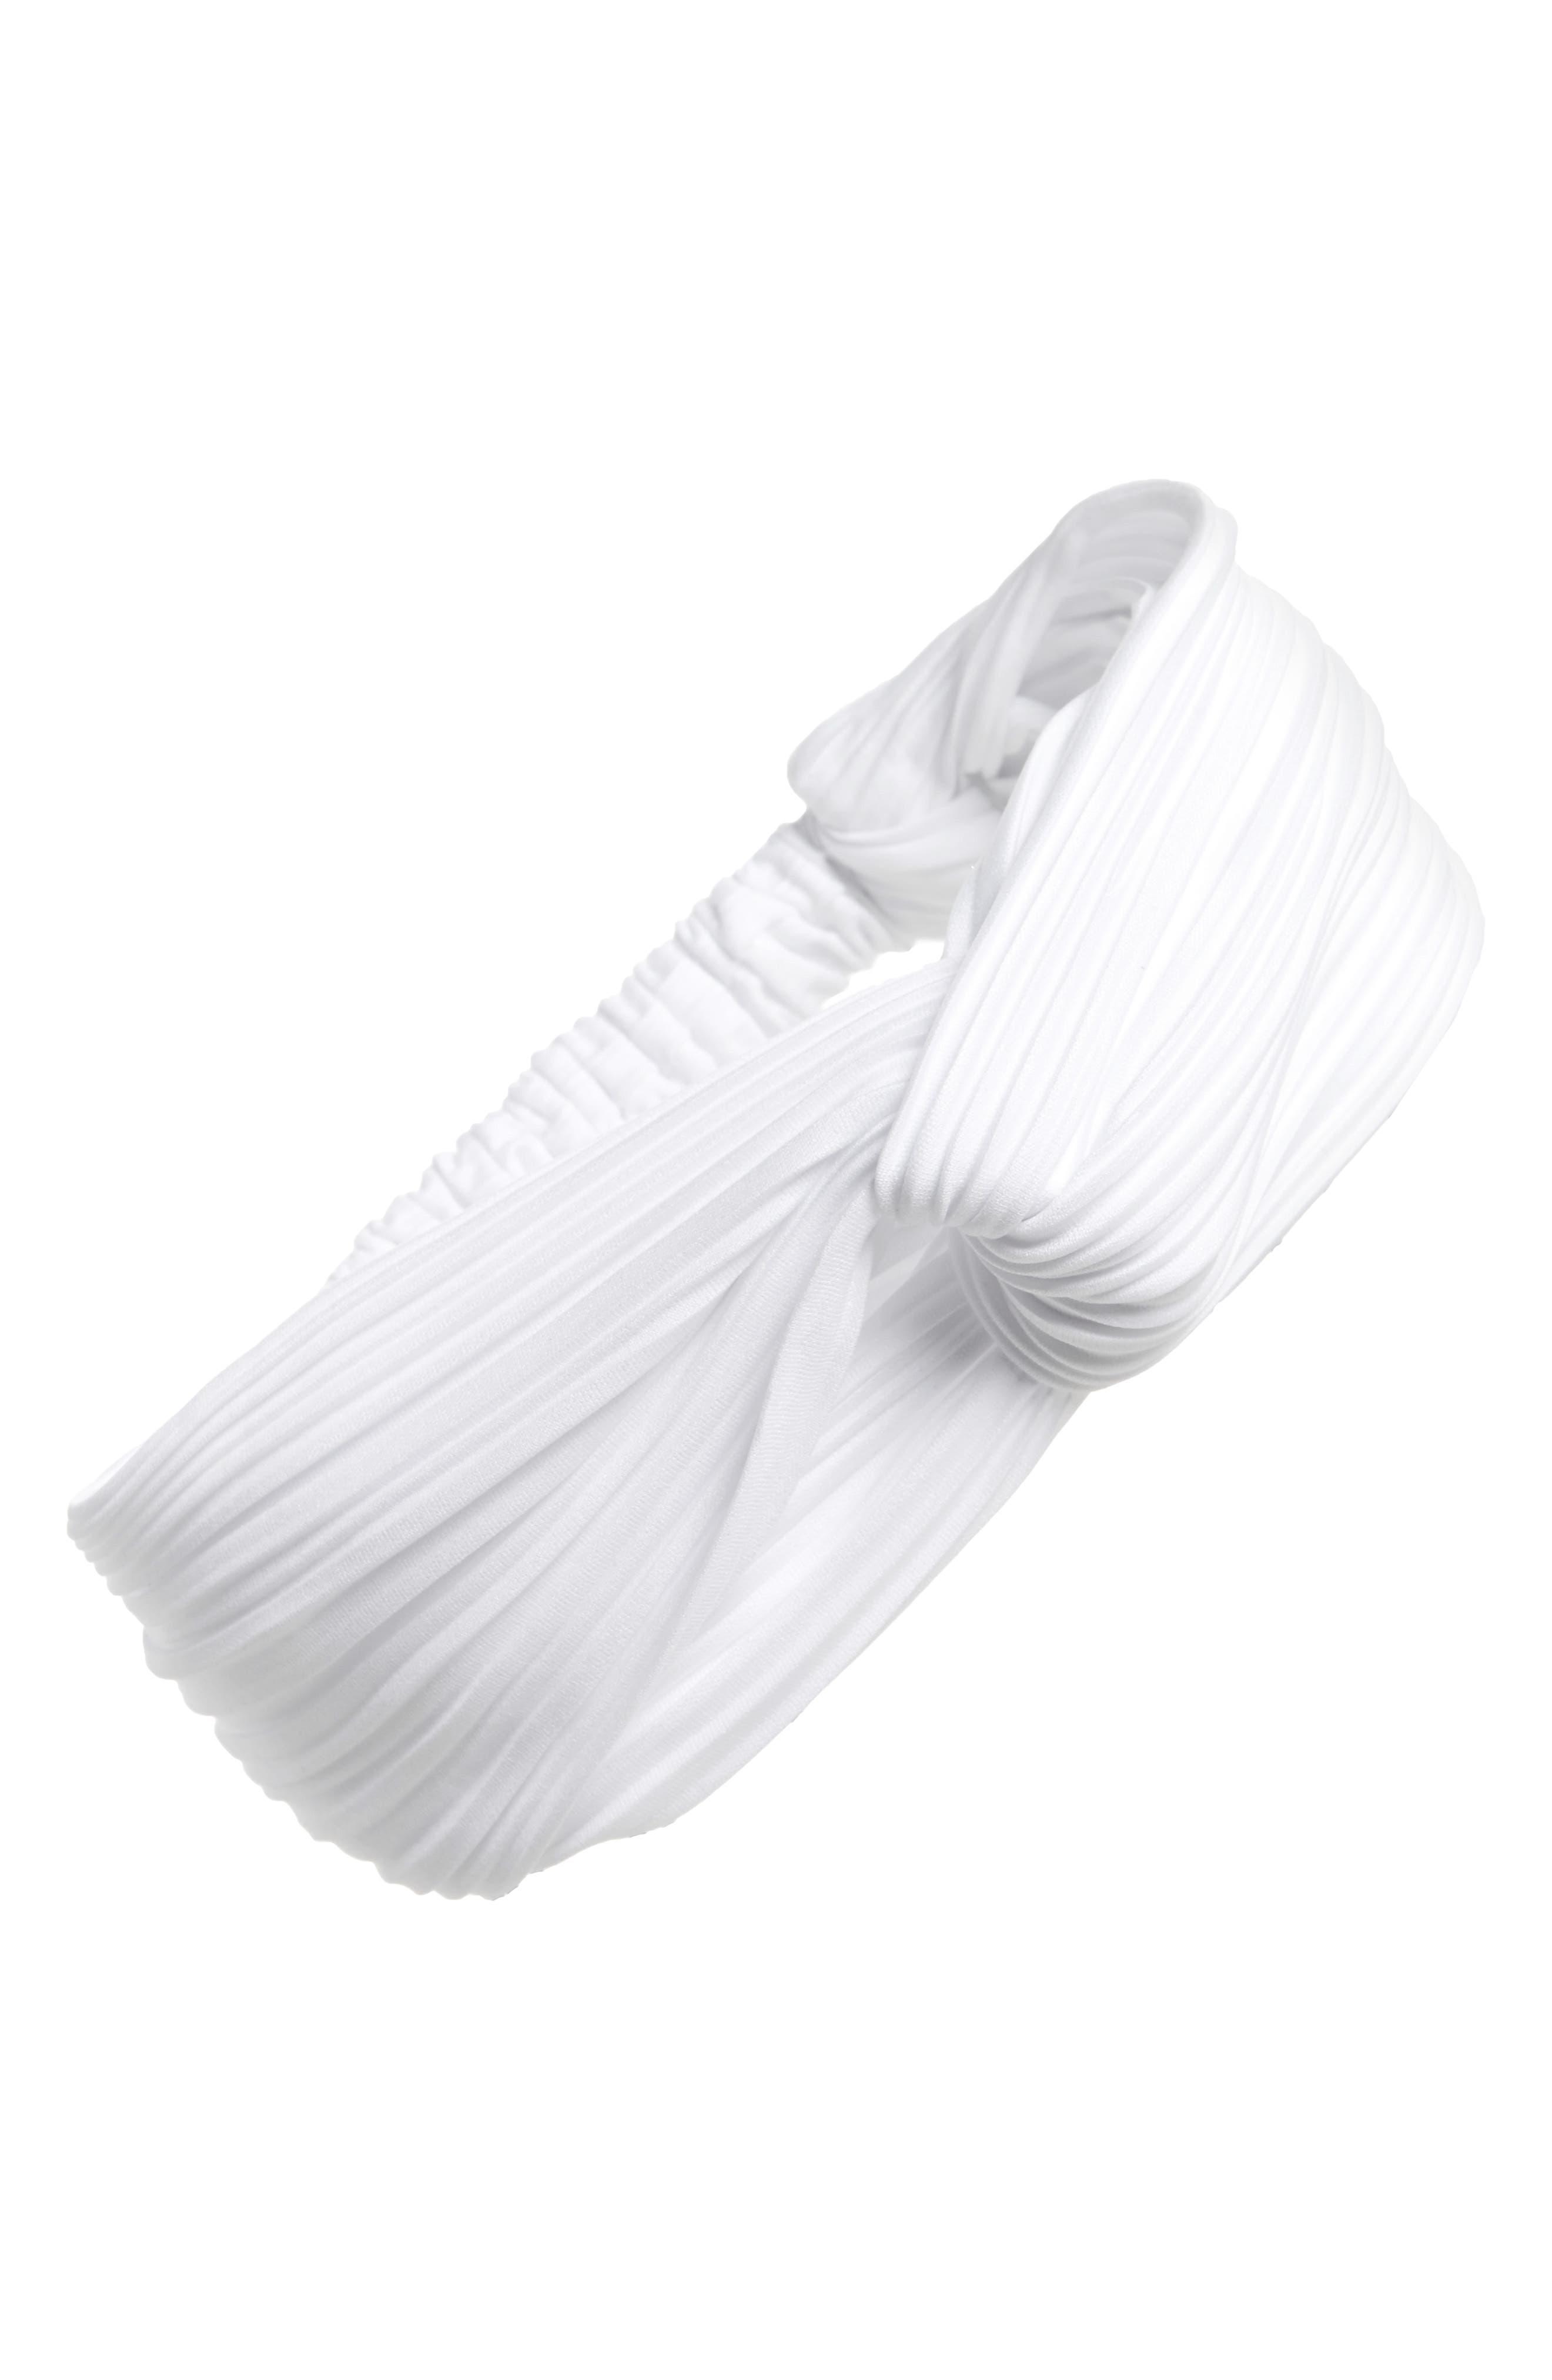 Pleated Turban Head Wrap,                             Main thumbnail 1, color,                             White